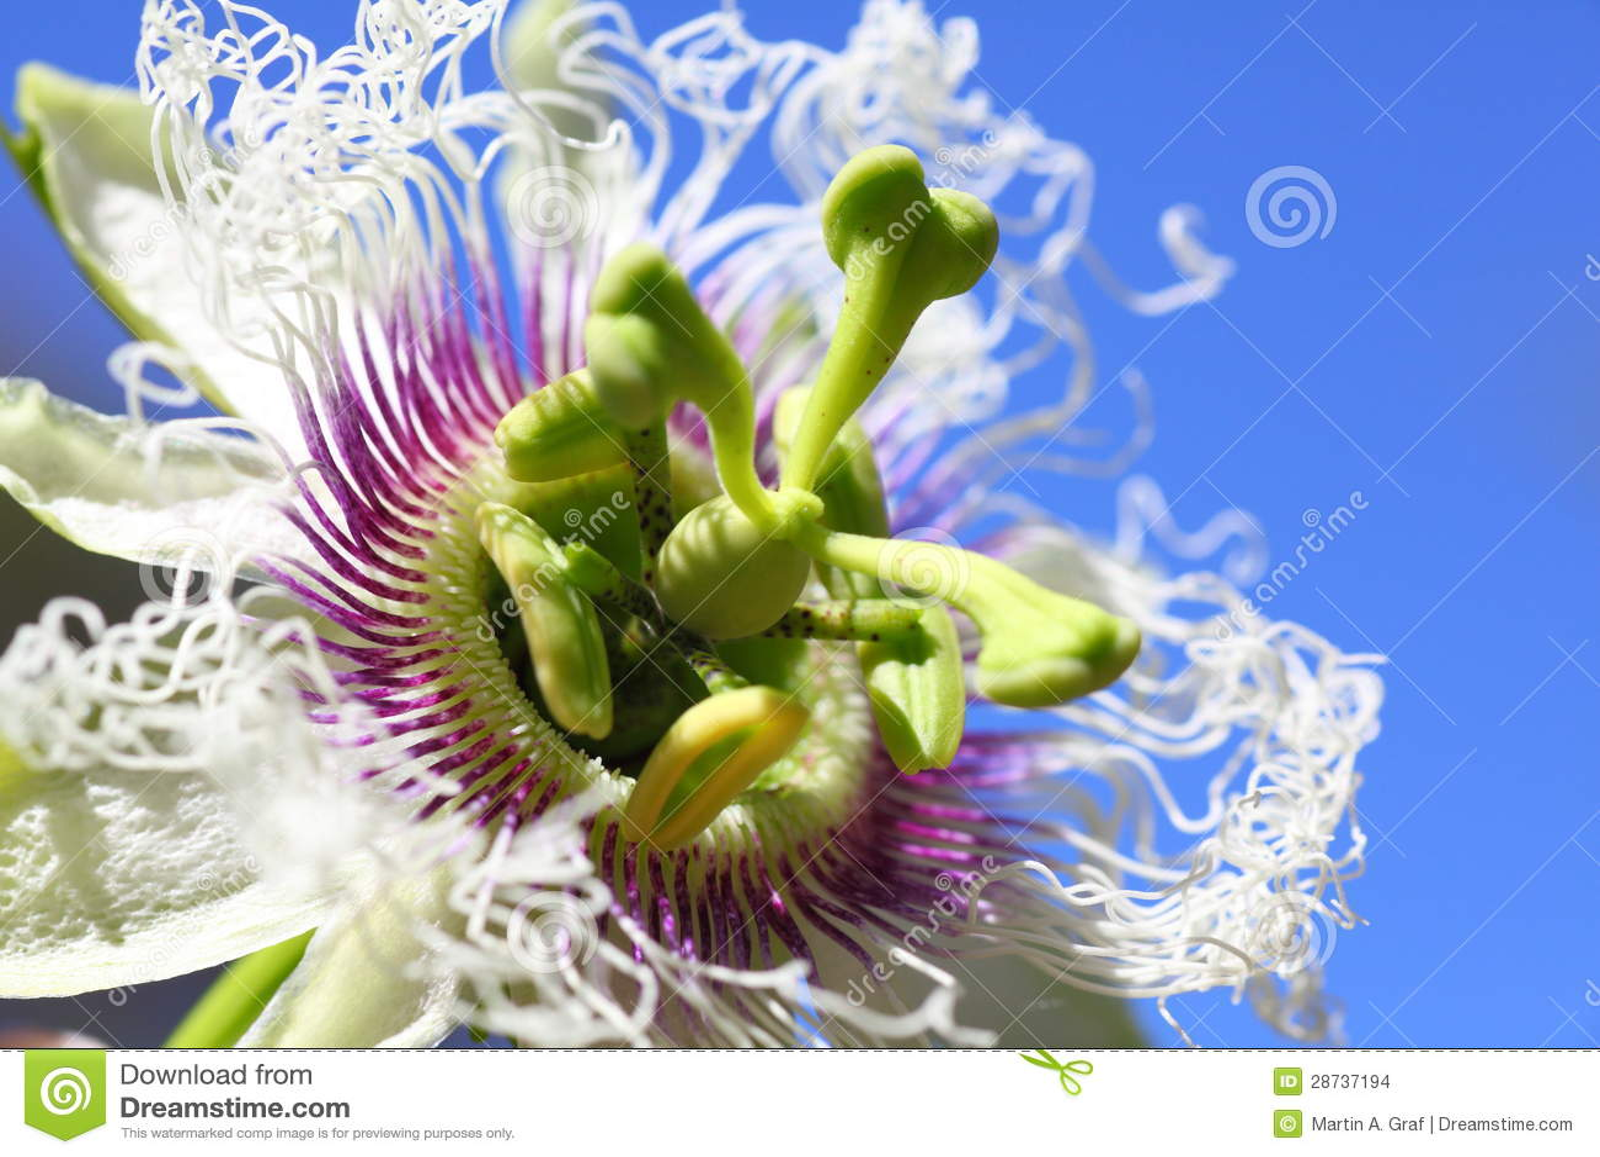 Passion Fruit Flower Macro Stock Image